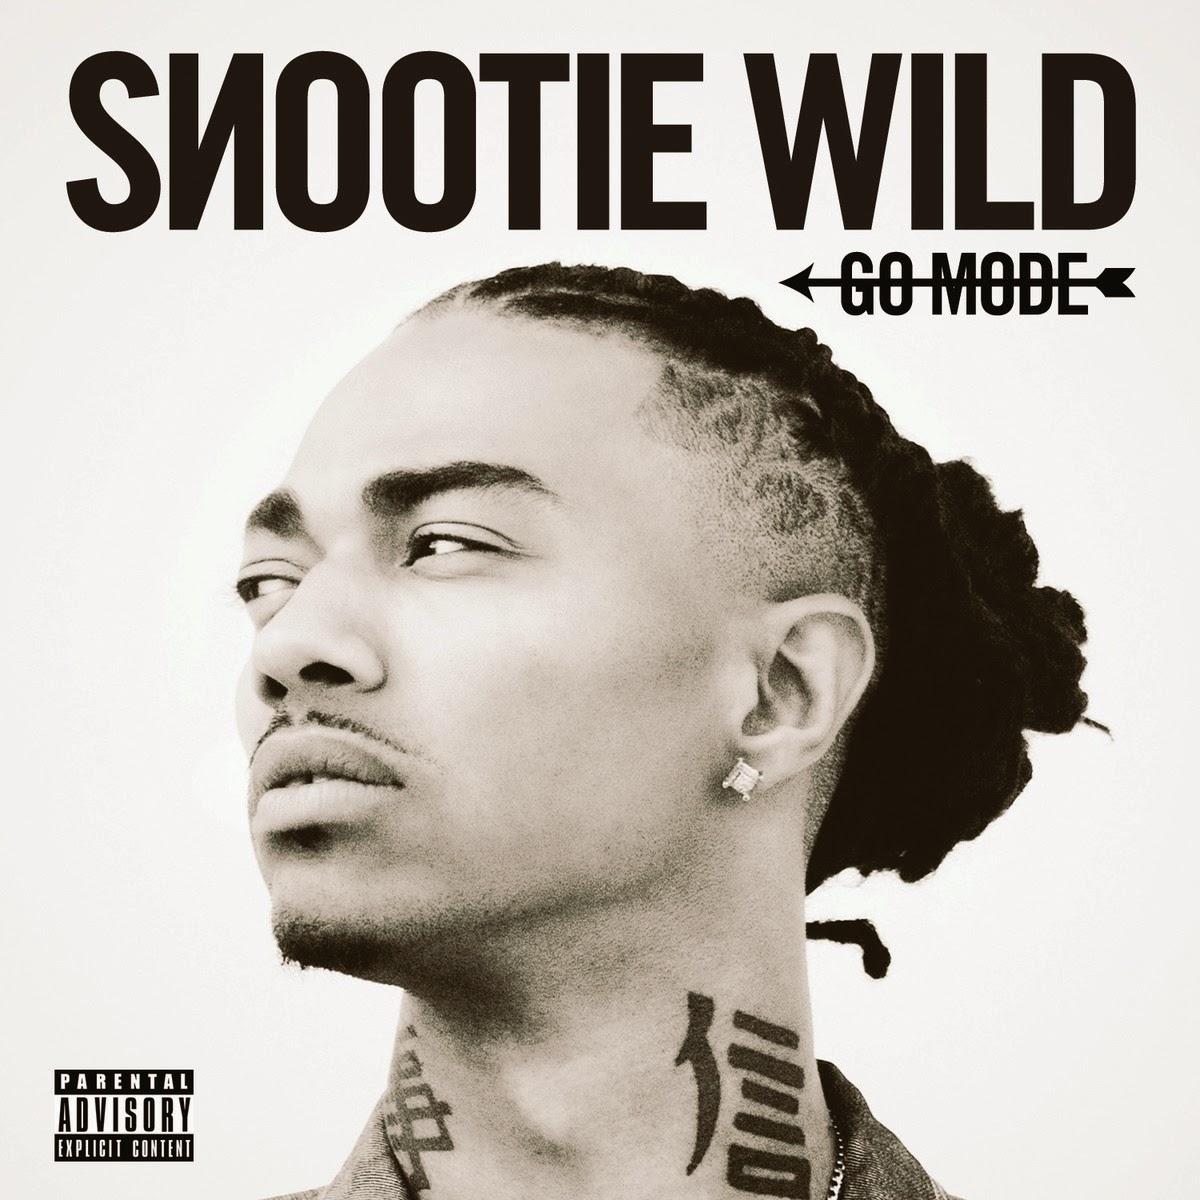 Snootie Wild - Go Mode - EP Cover